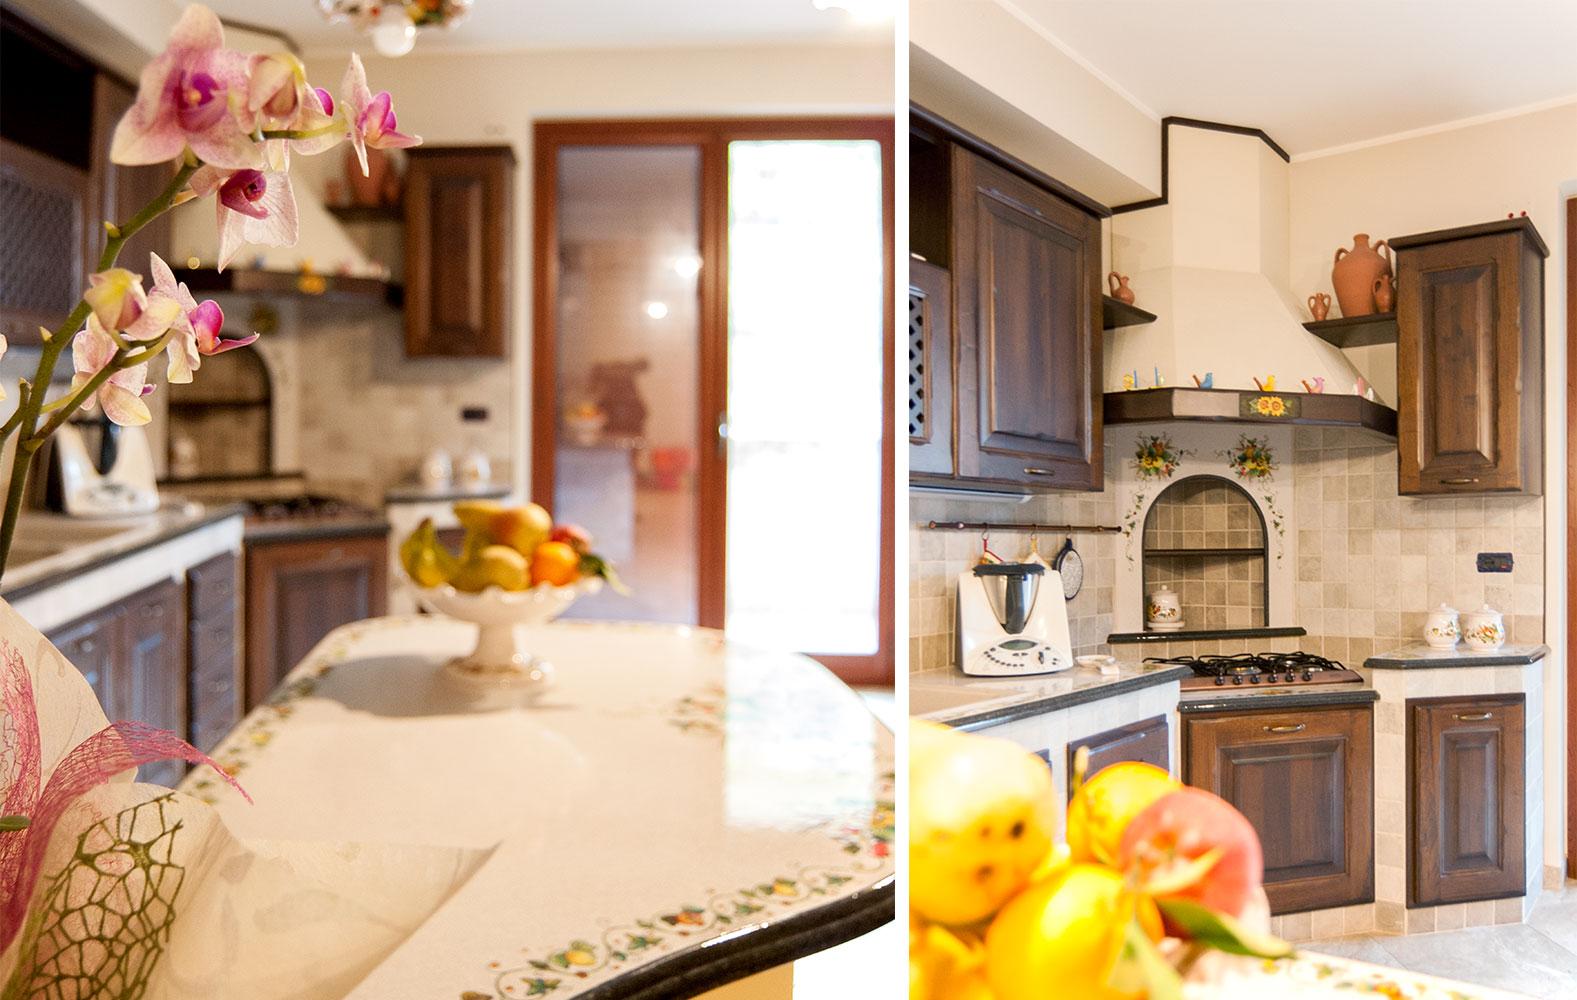 Penisola Cucina In Muratura cucine in muratura smontabile con top in pietra lavica